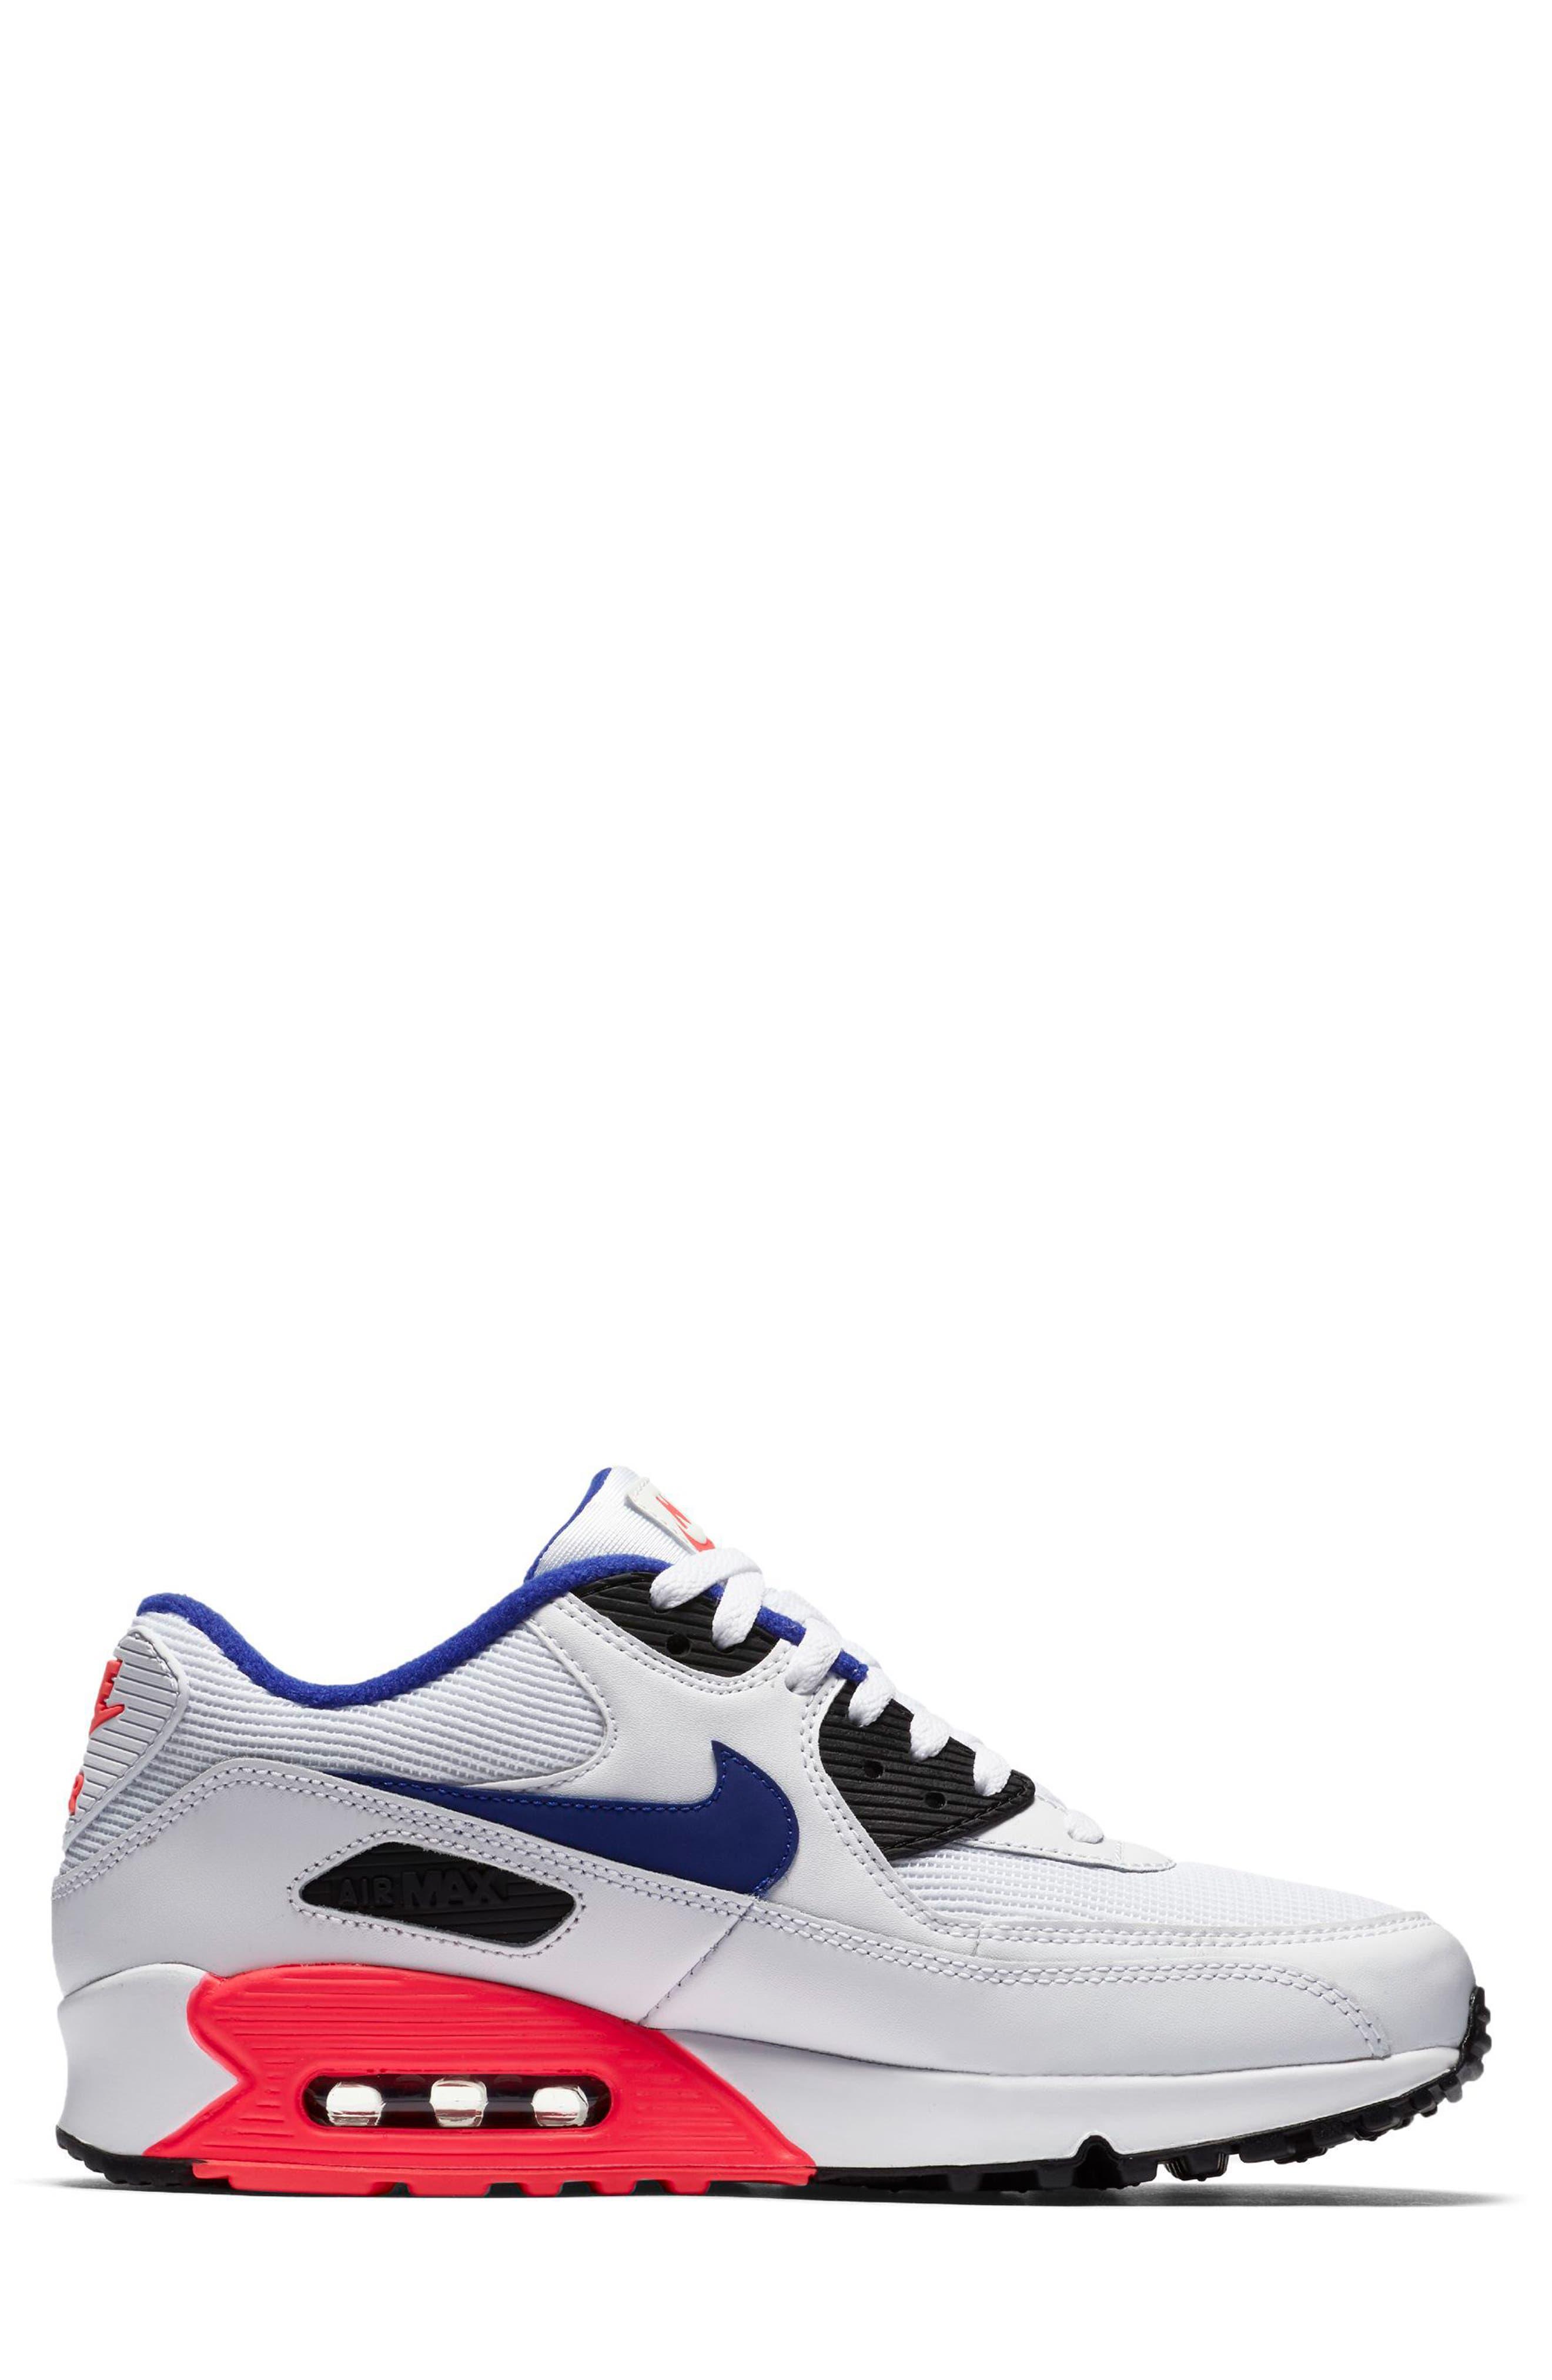 Air Max 90 Essential Sneaker,                             Alternate thumbnail 3, color,                             WHITE/ ULTRAMARINE